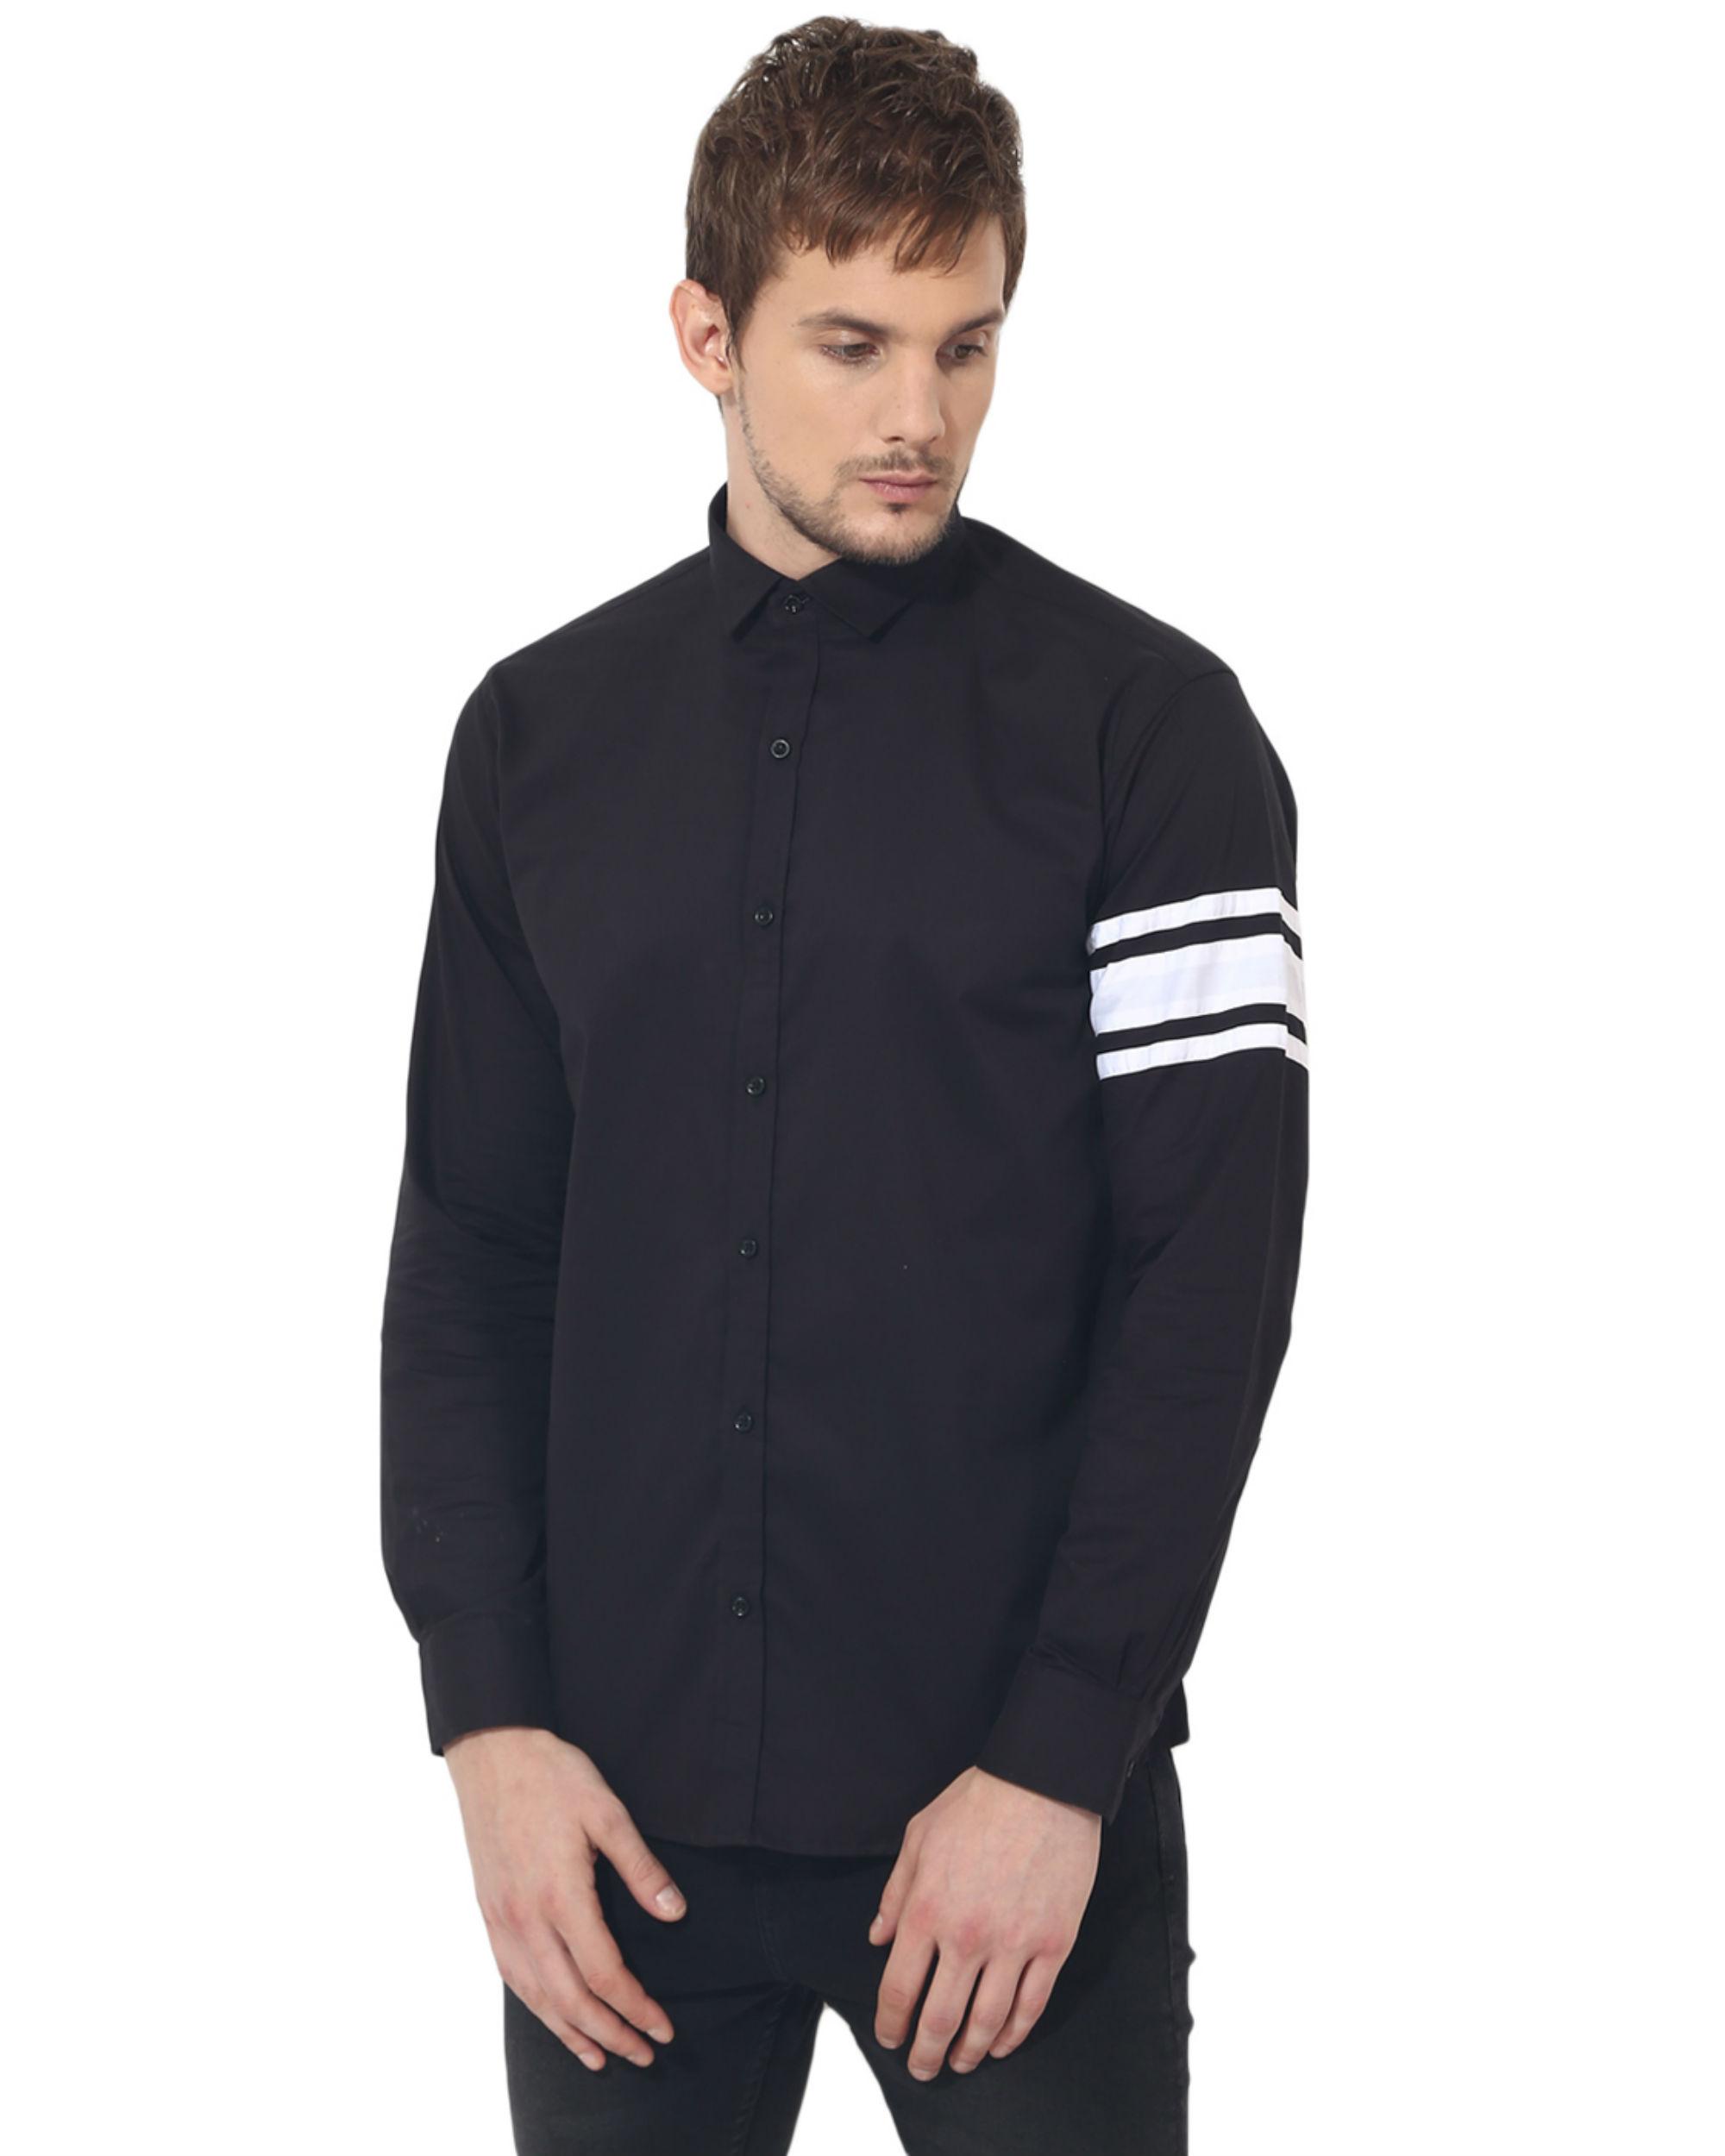 Black sleeve panel club wear shirt